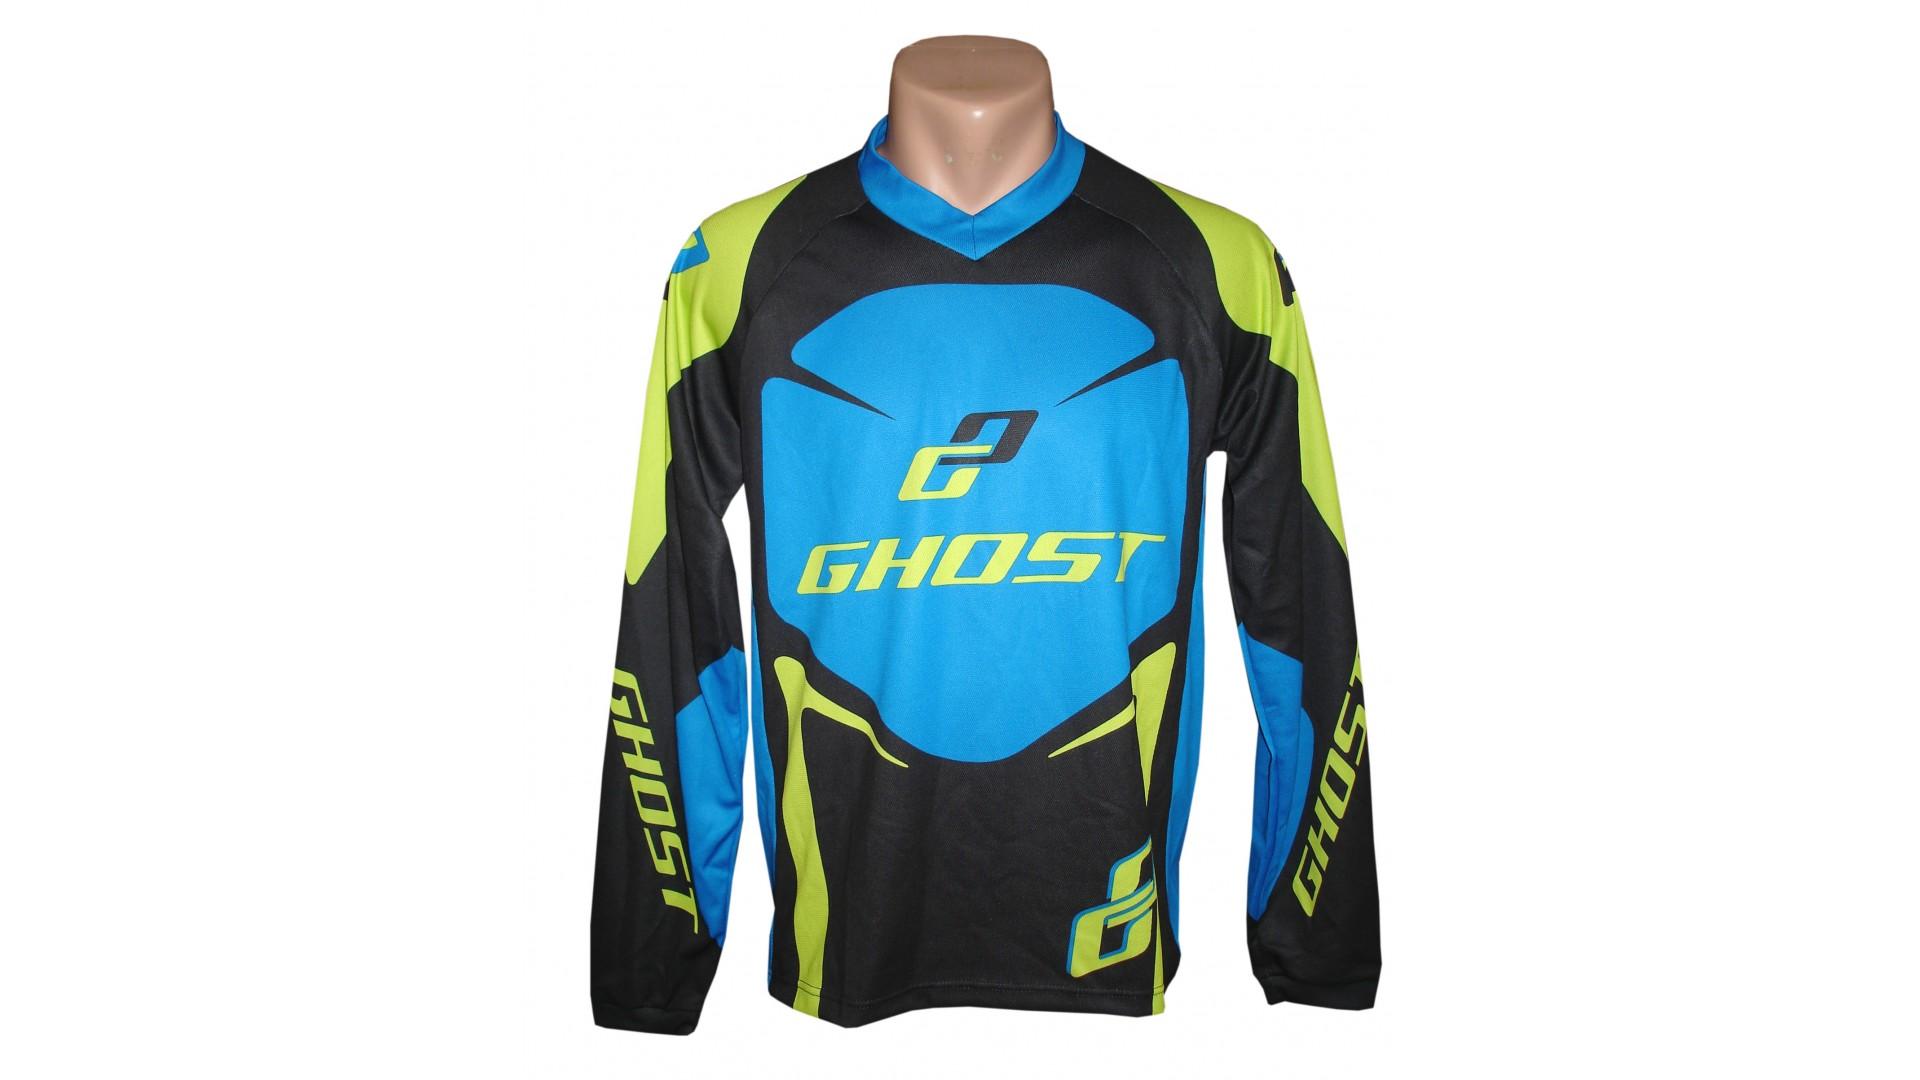 Веломайка Ghost с длинным рукавом black/blue/green год 2014